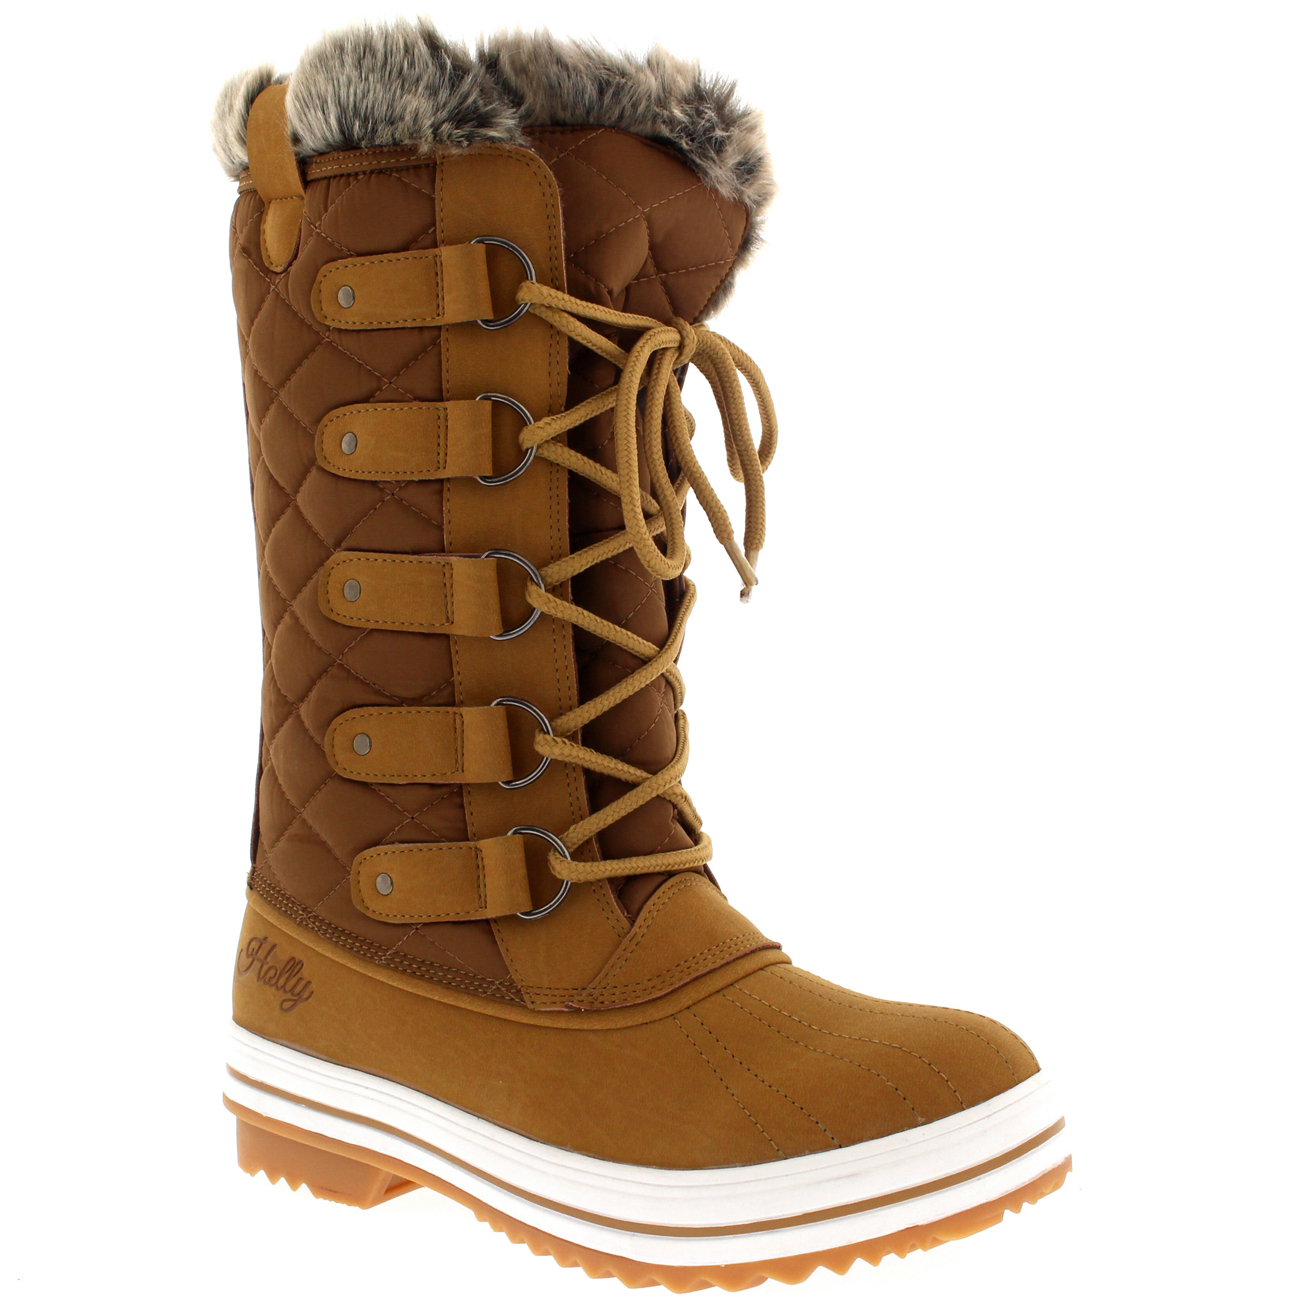 Popular Ugg Australia Adirondack Tall Womens Otter Leather Winter Boots  EBay